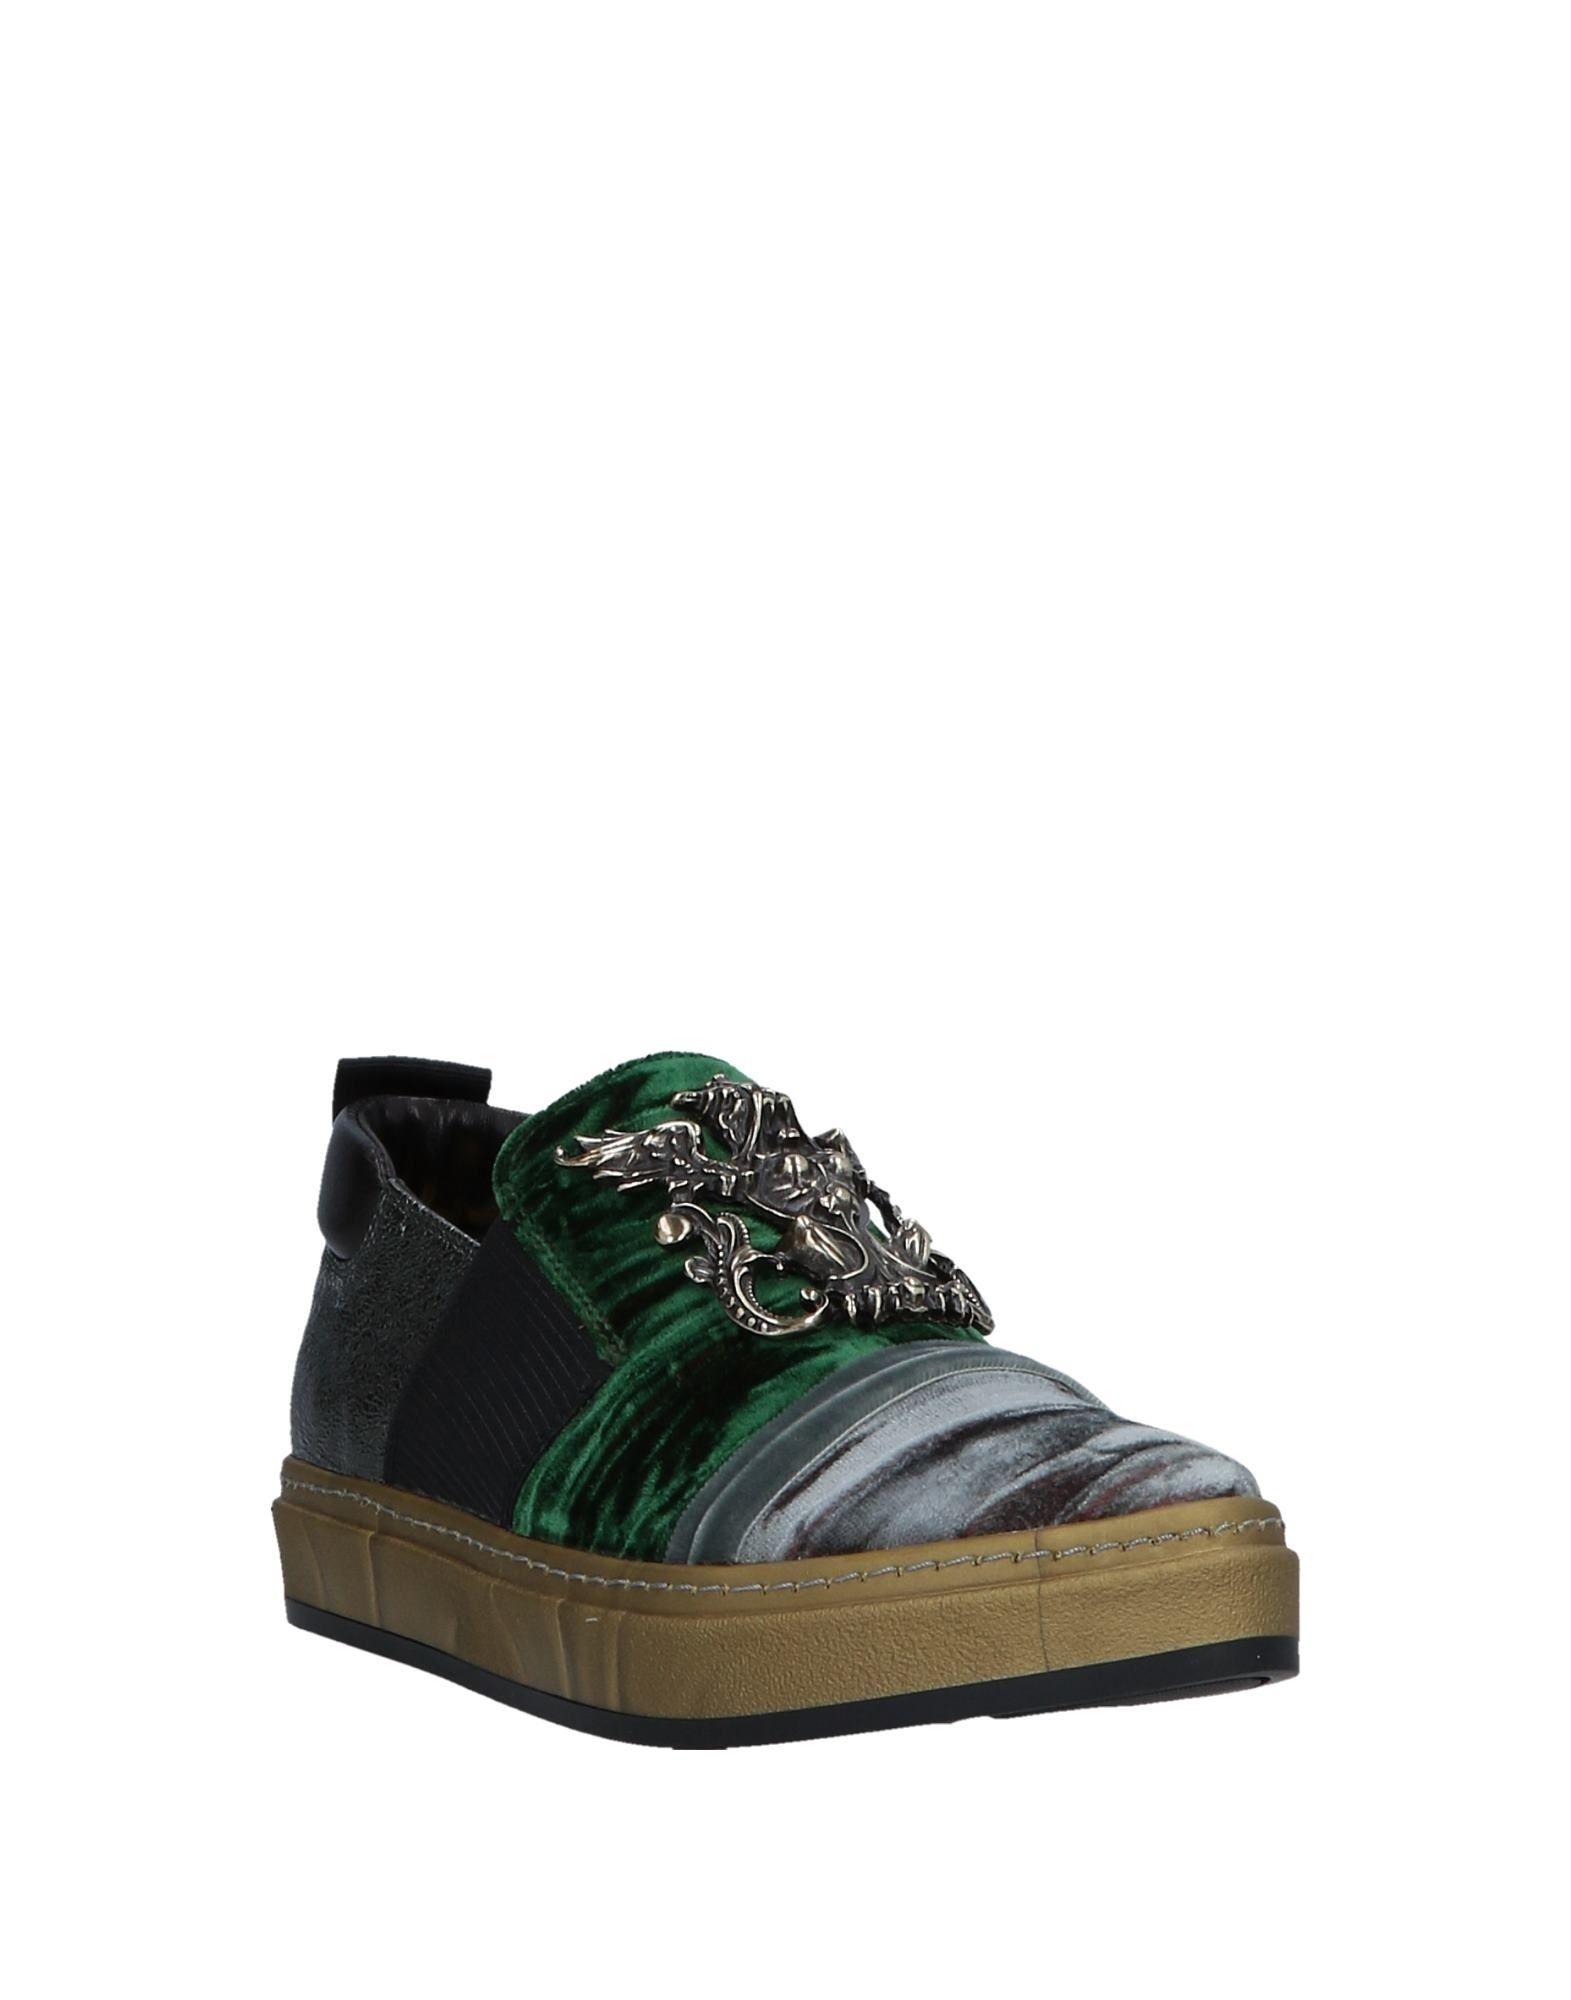 Shy By Arvid Yuki Sneakers Damen Schuhe  11499022XKGut aussehende strapazierfähige Schuhe Damen 934ceb